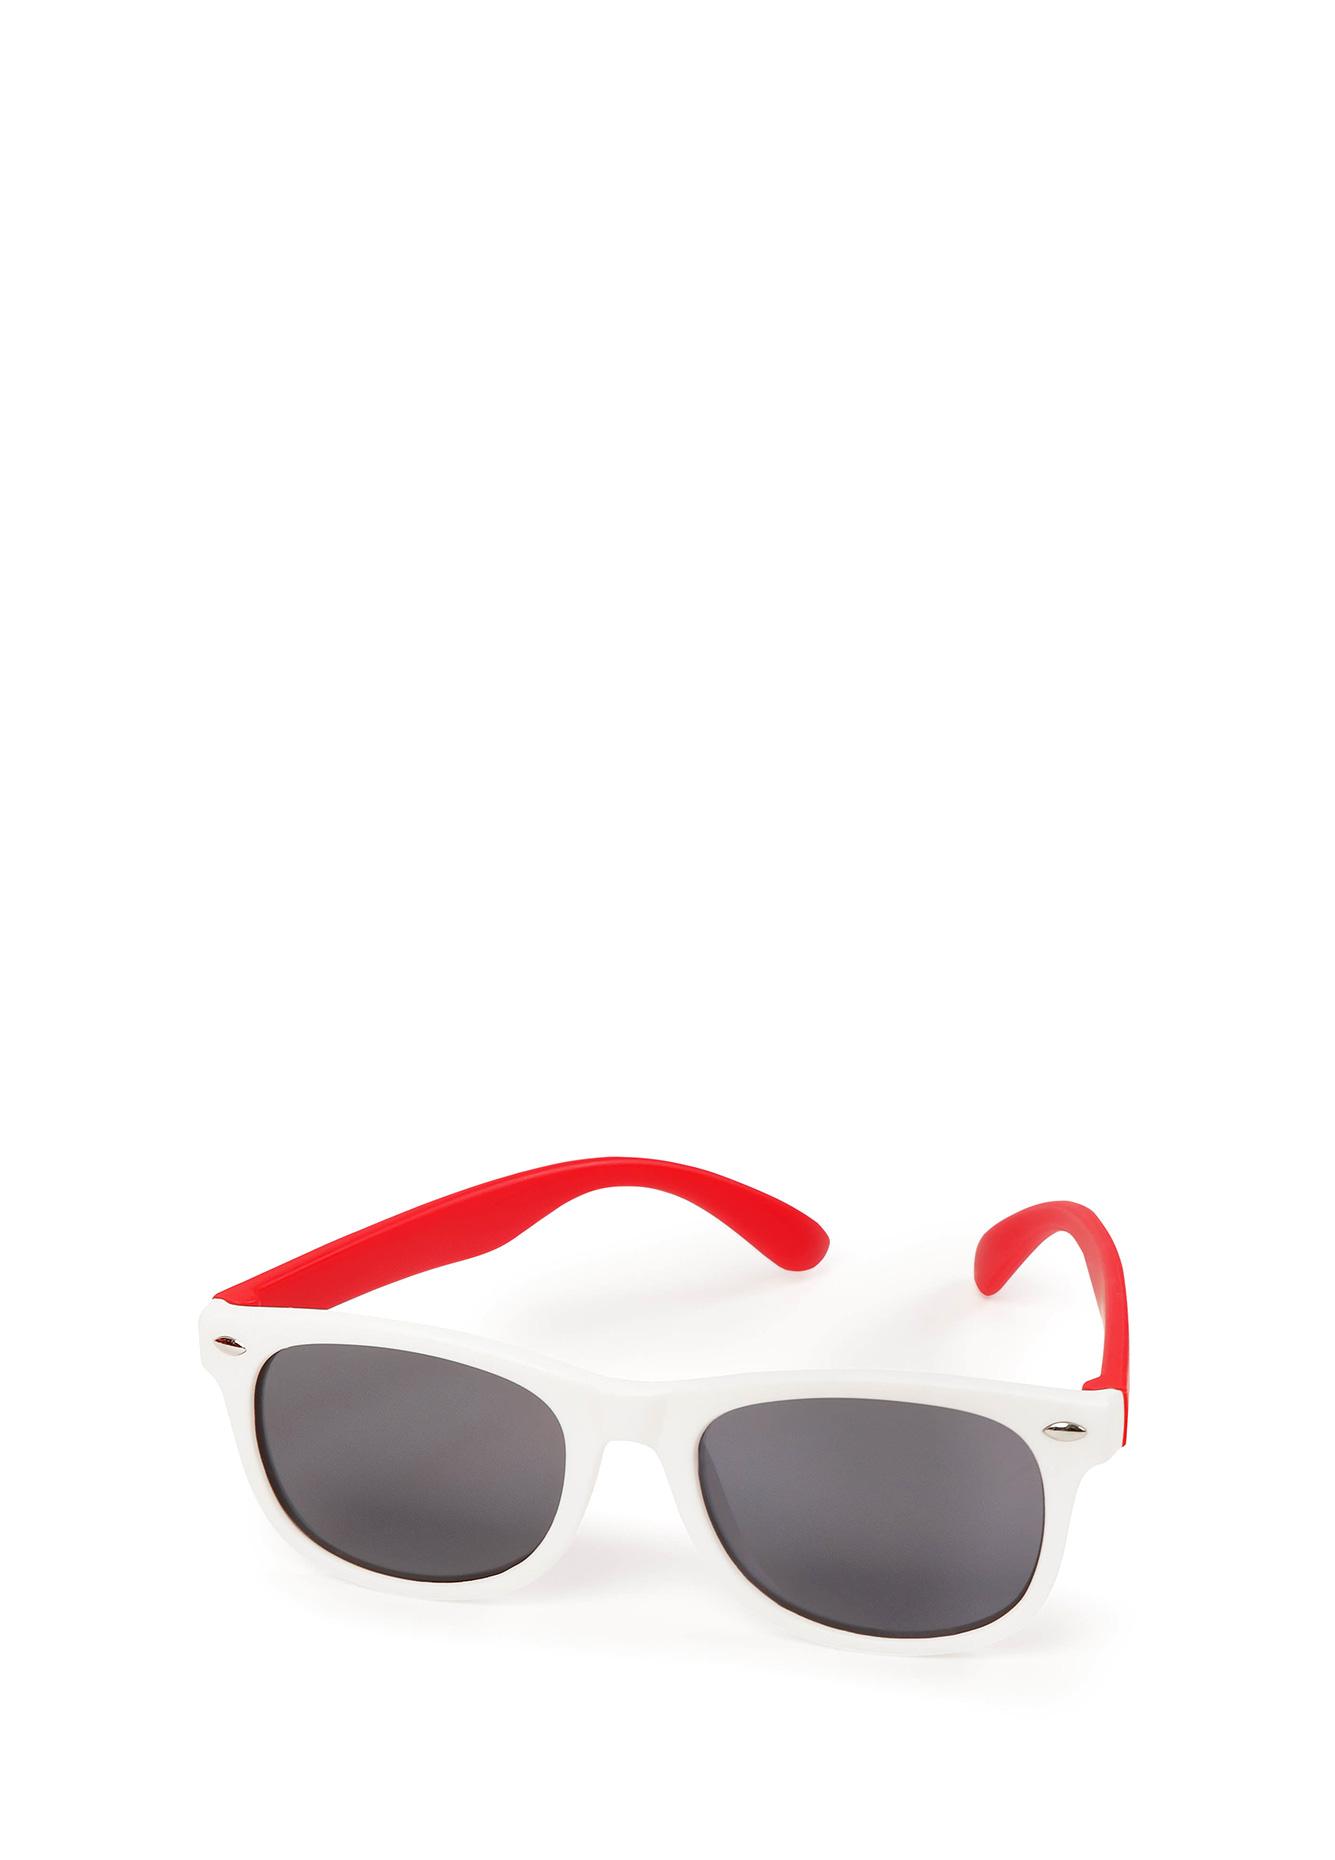 Очки солнцезащитные Happy Baby White and red